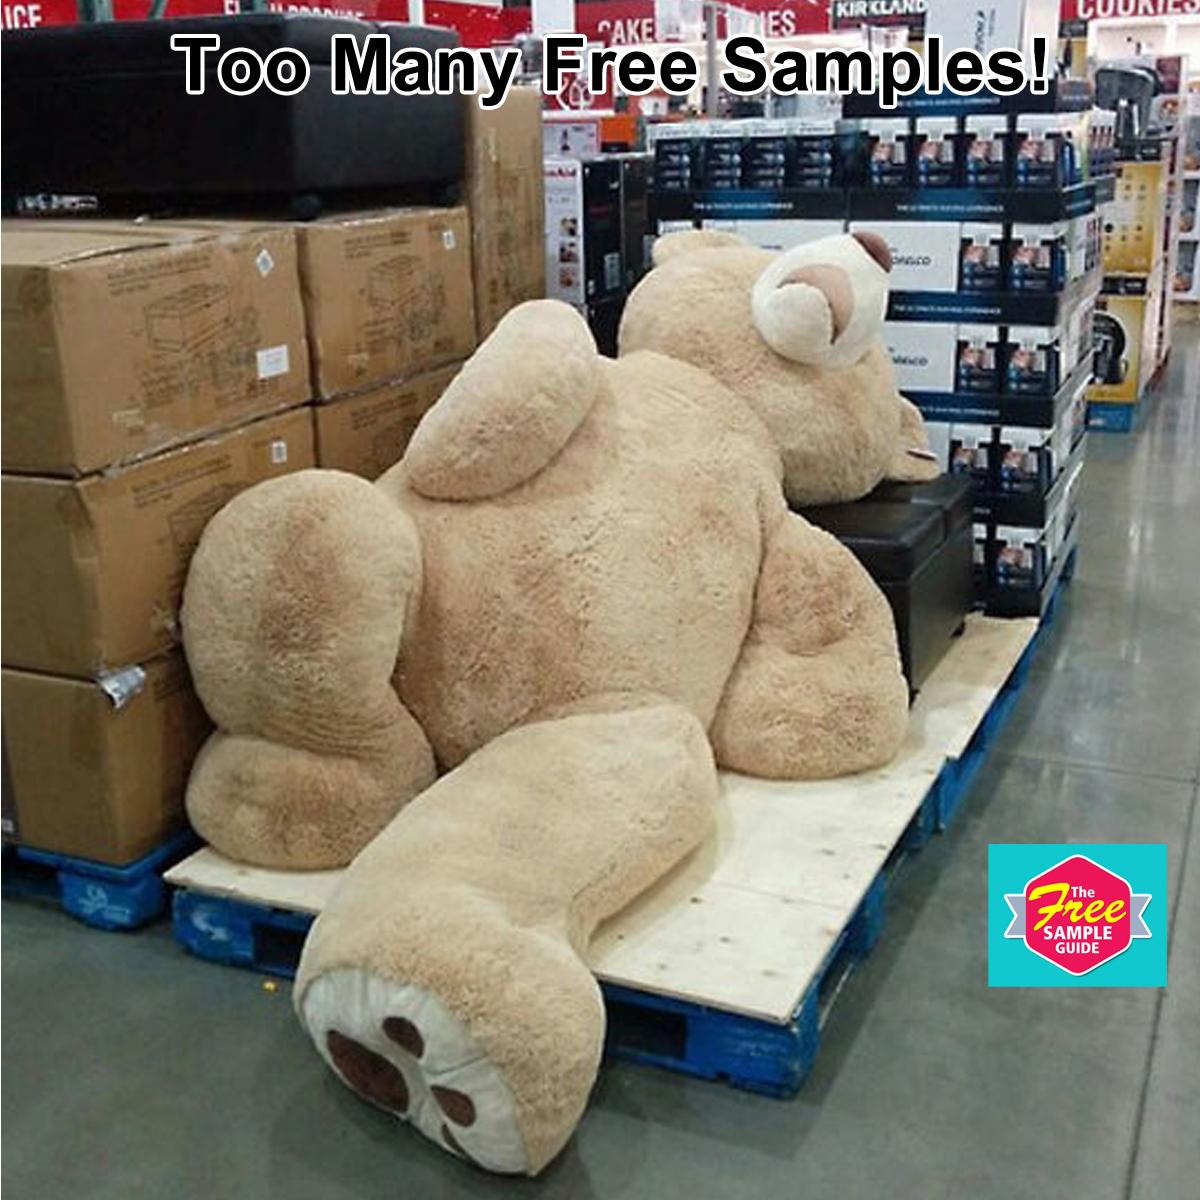 Too-Many-free-samples.-.jpg